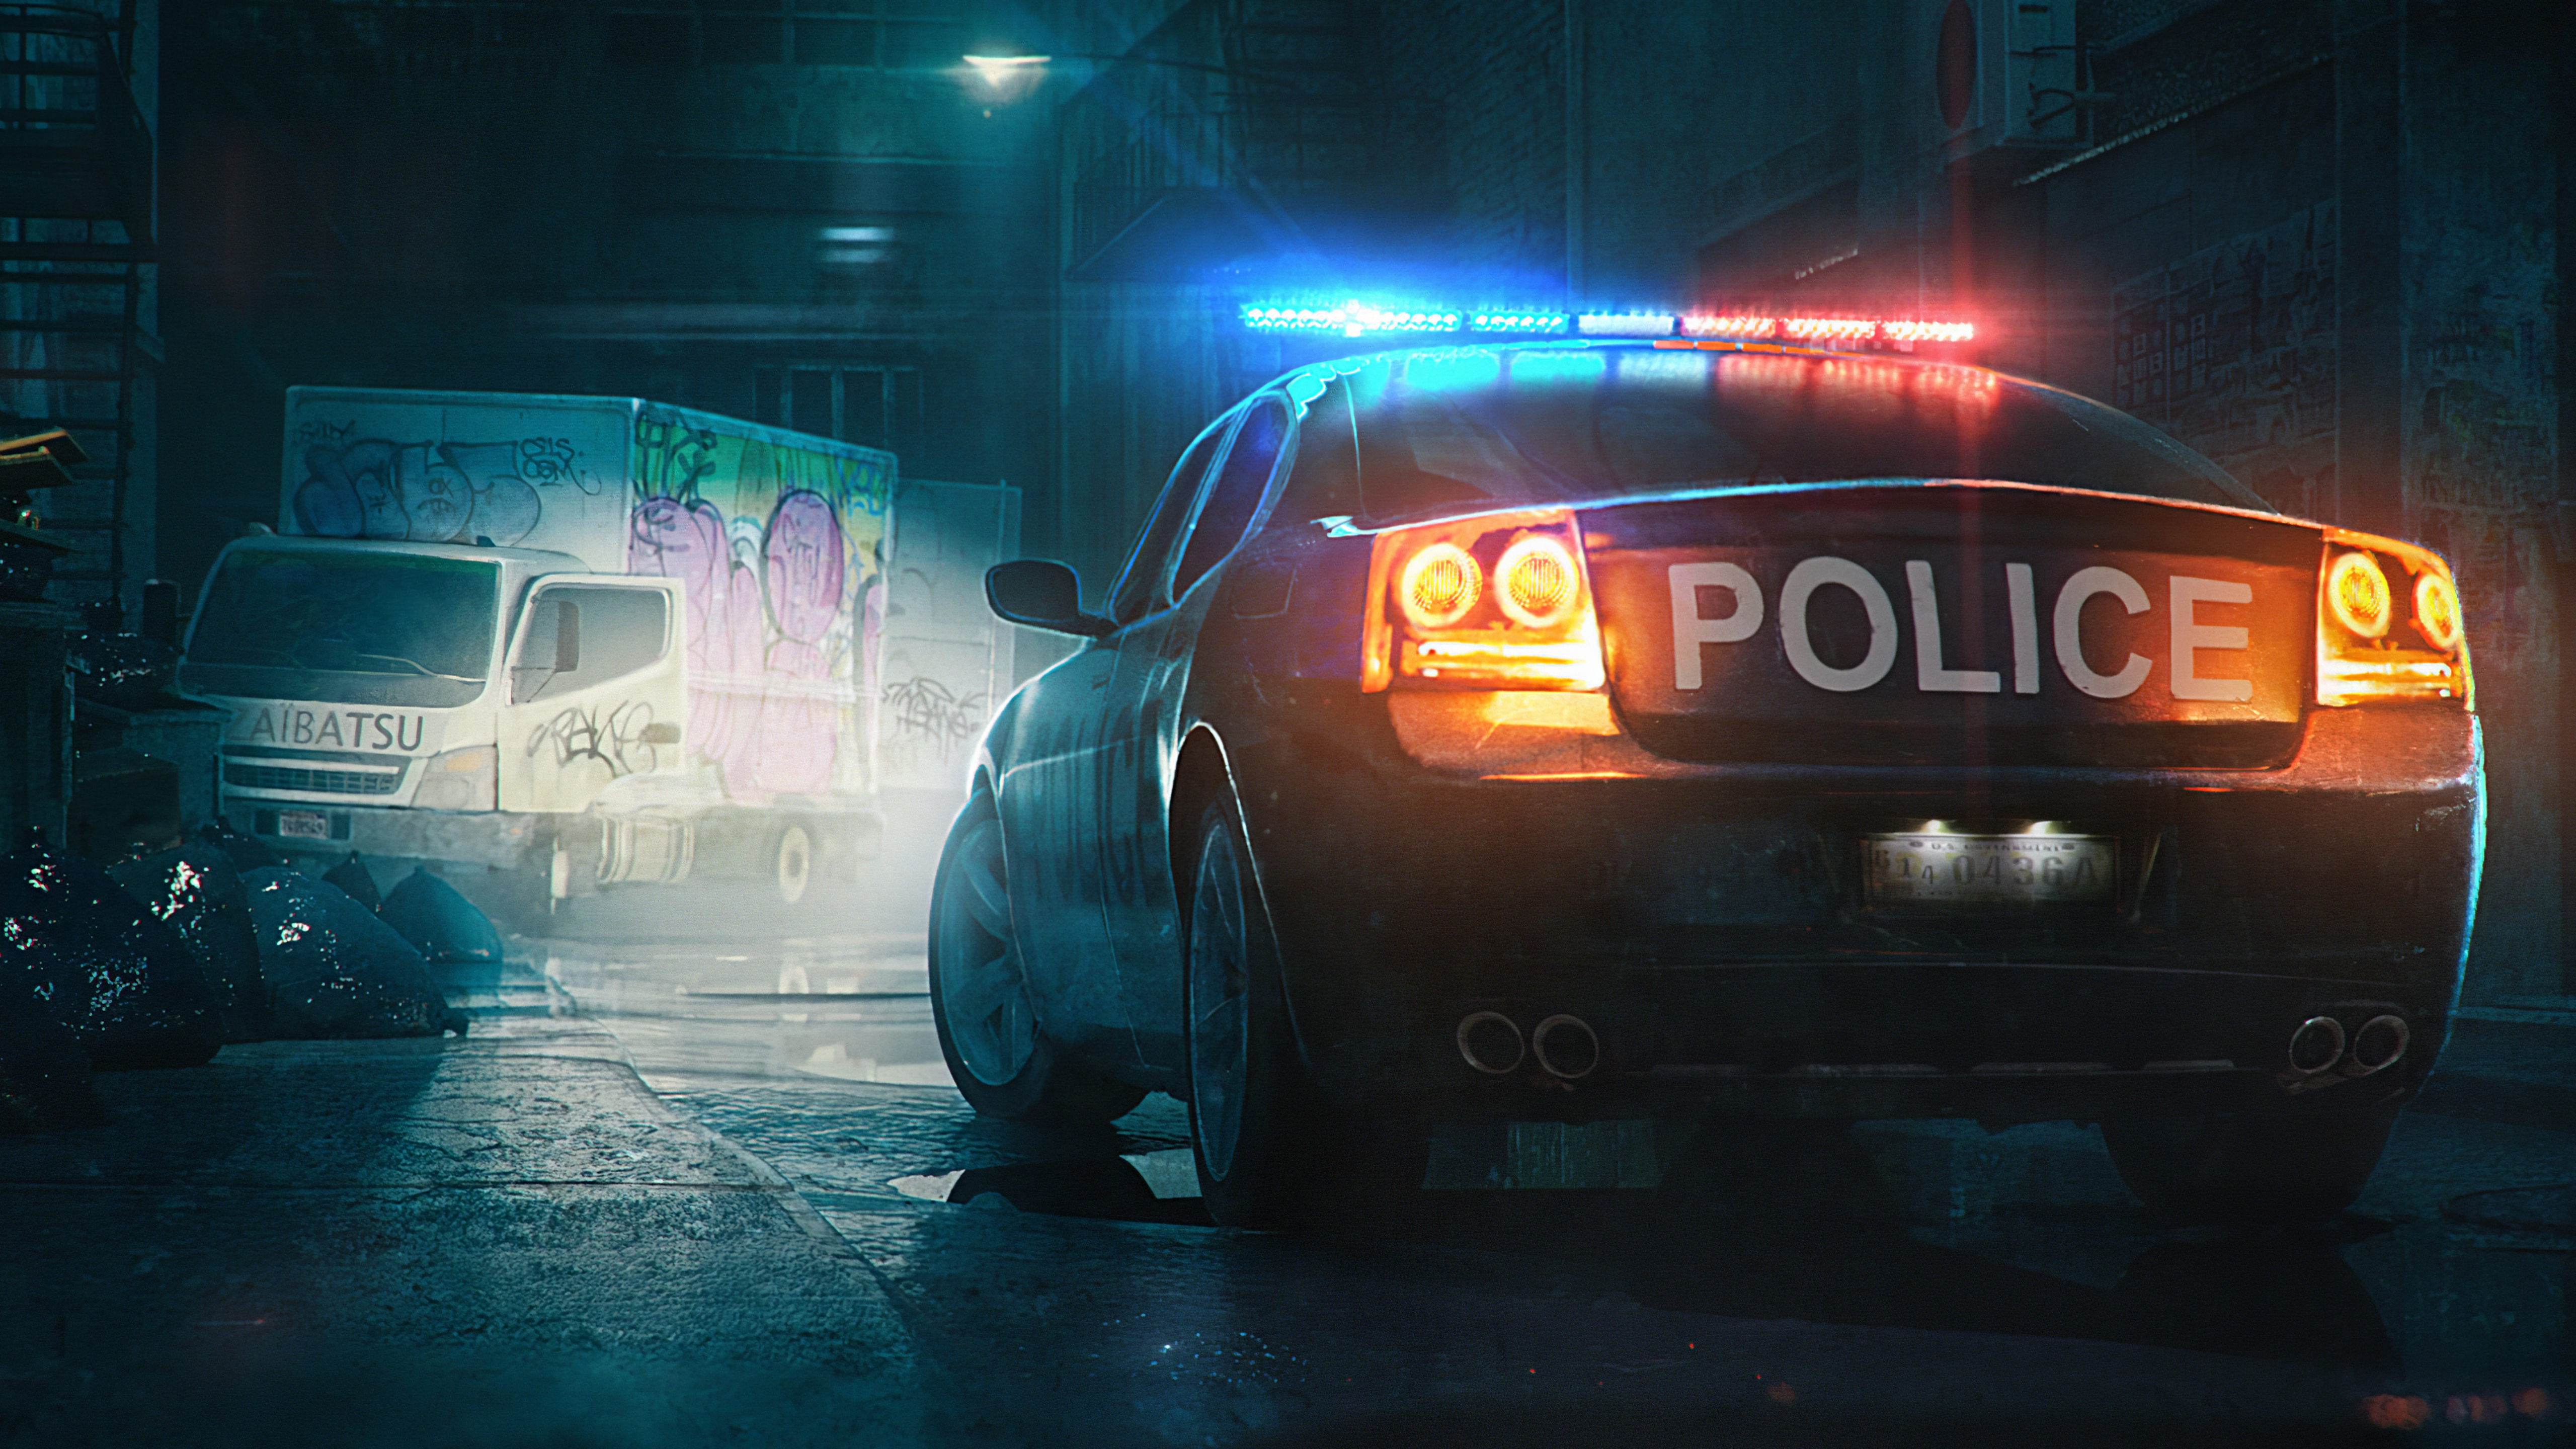 police-patrol-car-digital-art-5k-bf.jpg